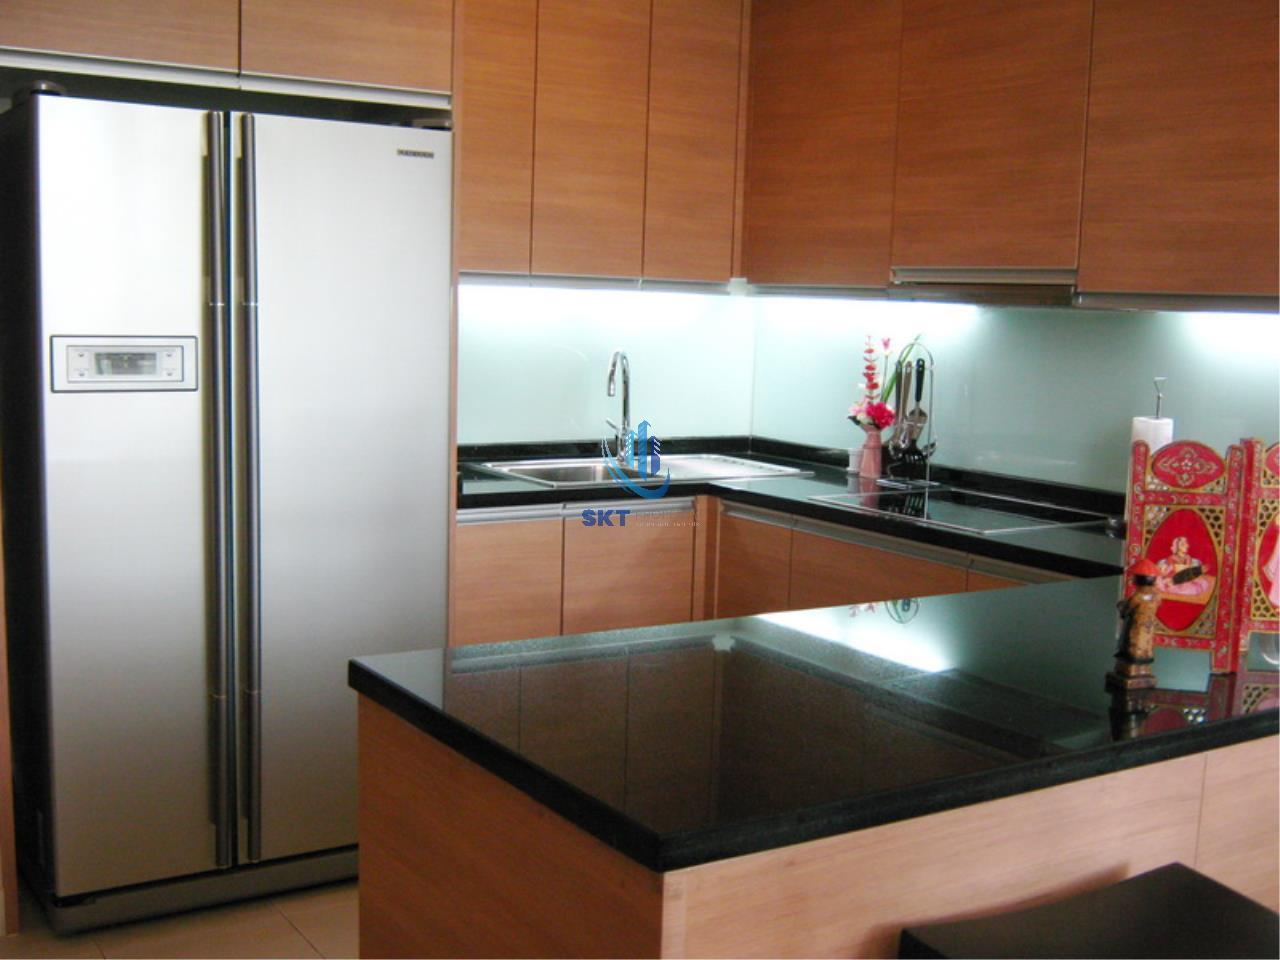 Sukritta Property Agency's D'Raj Residences - Bts Asoke 10